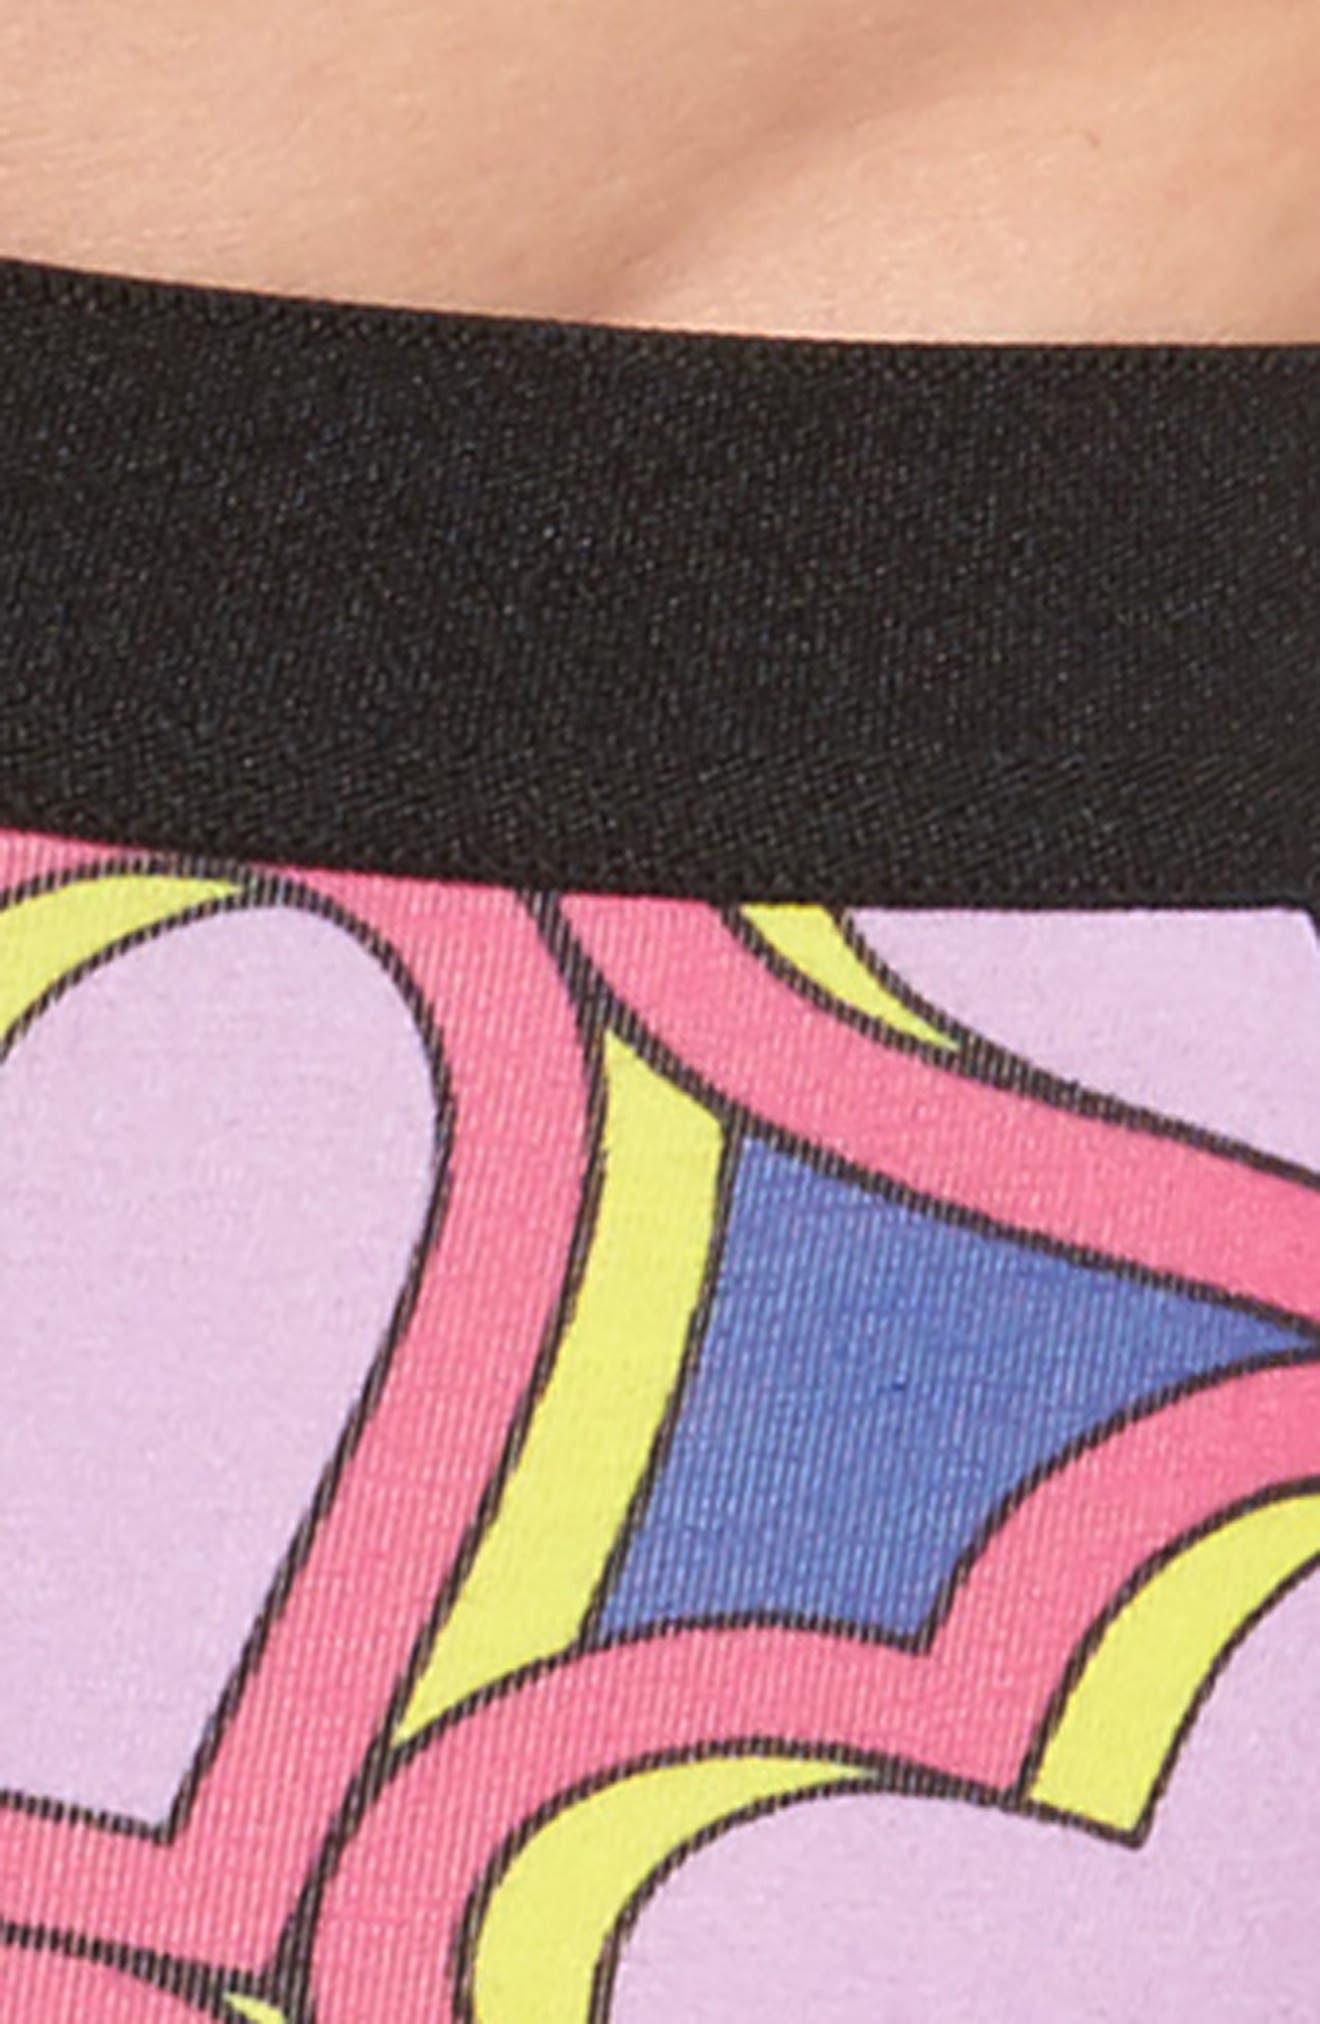 Pop Art Hearts Stretch Cotton Trunks,                             Alternate thumbnail 4, color,                             684